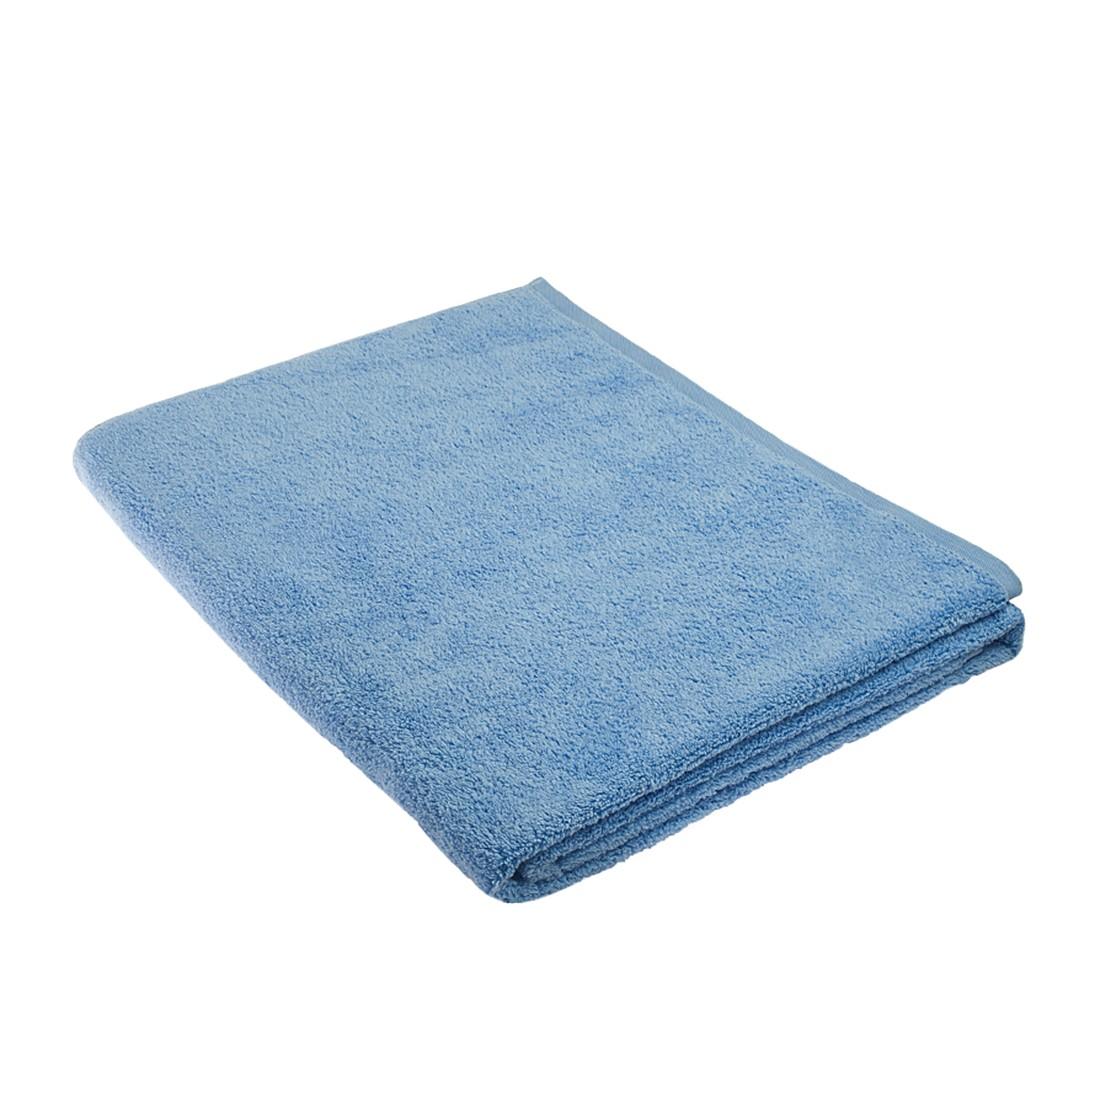 Home 24 - Serviette de sauna pure - 100 % coton - bleu clair, stilana